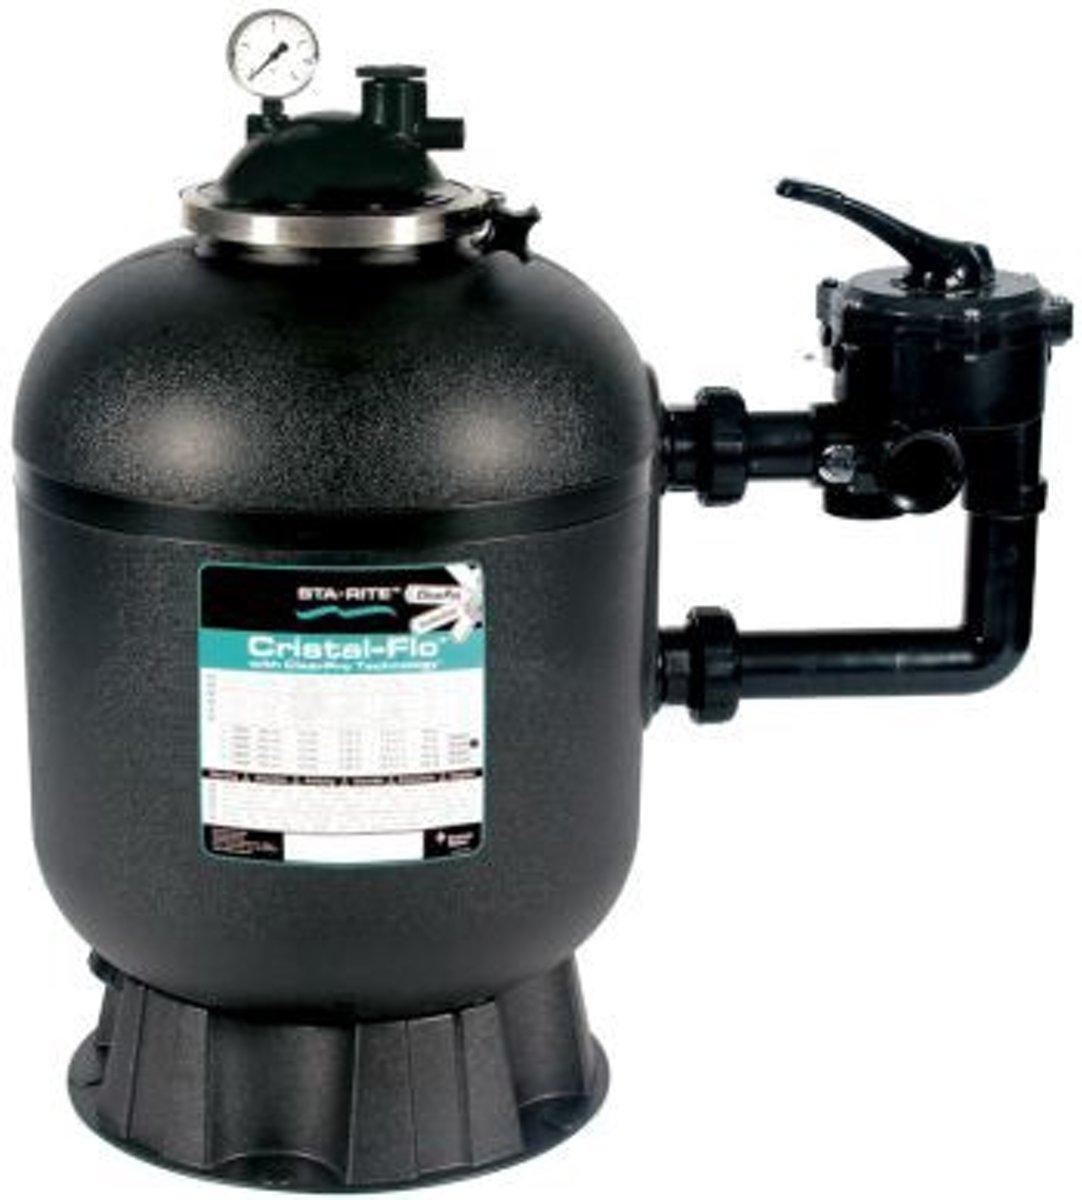 STA-RITE CRISTAL-FLO™ ZANDFILTER MET CLEARPRO TECHNOLOGY® SM-600 Ø60cm